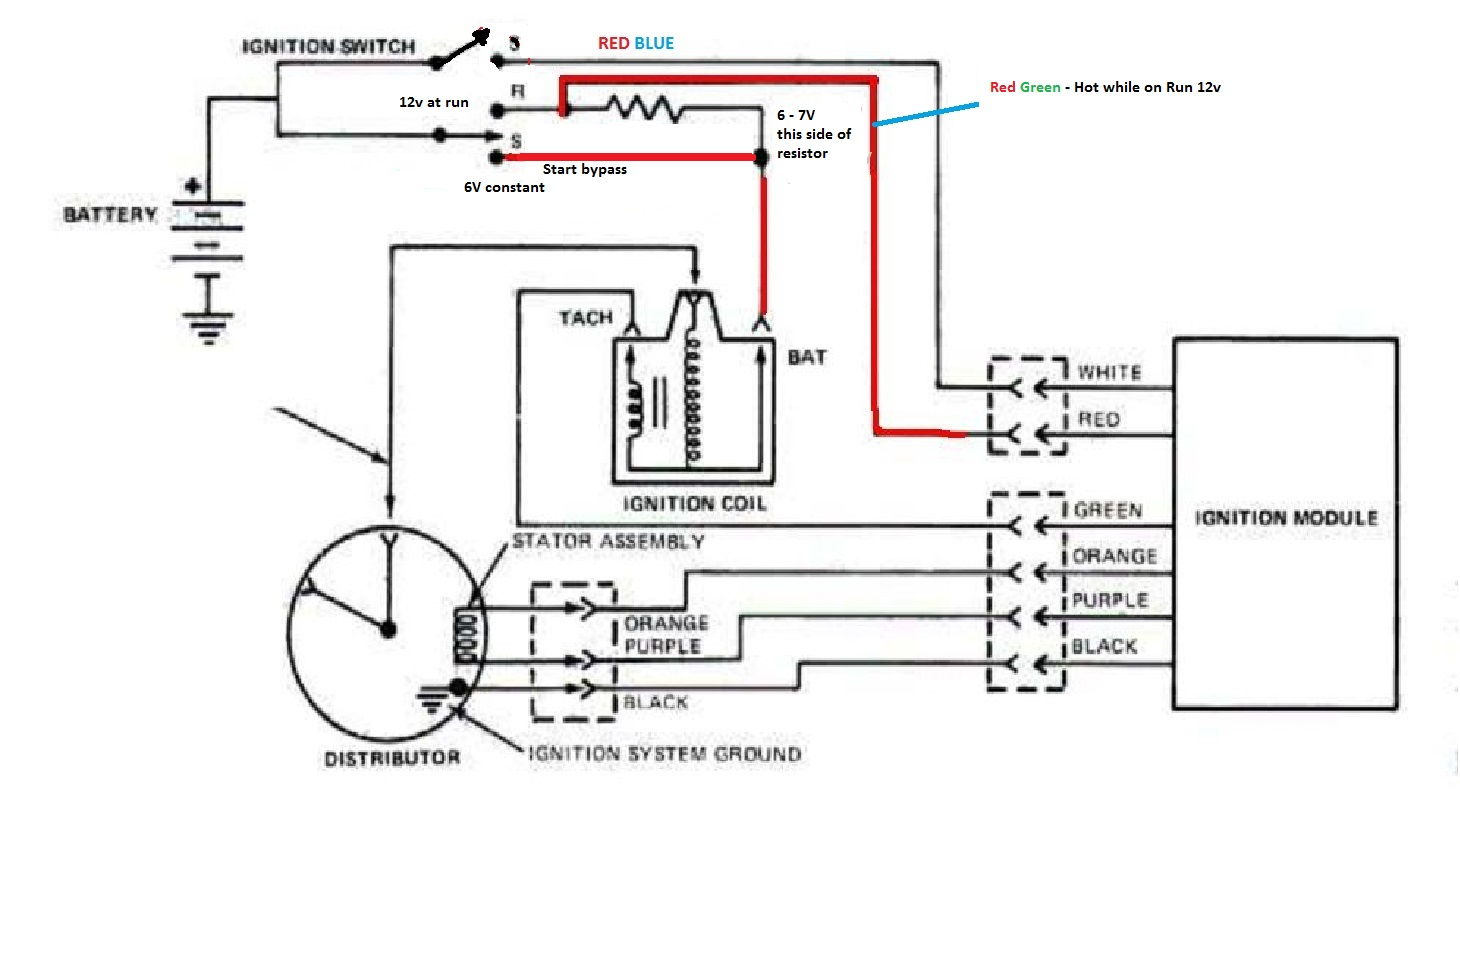 1989 Jag 340 Wiring Diagram Wire Data Schema Arctic Cat Panther For 1973 Pantera Seats Elsavadorla Afx 440